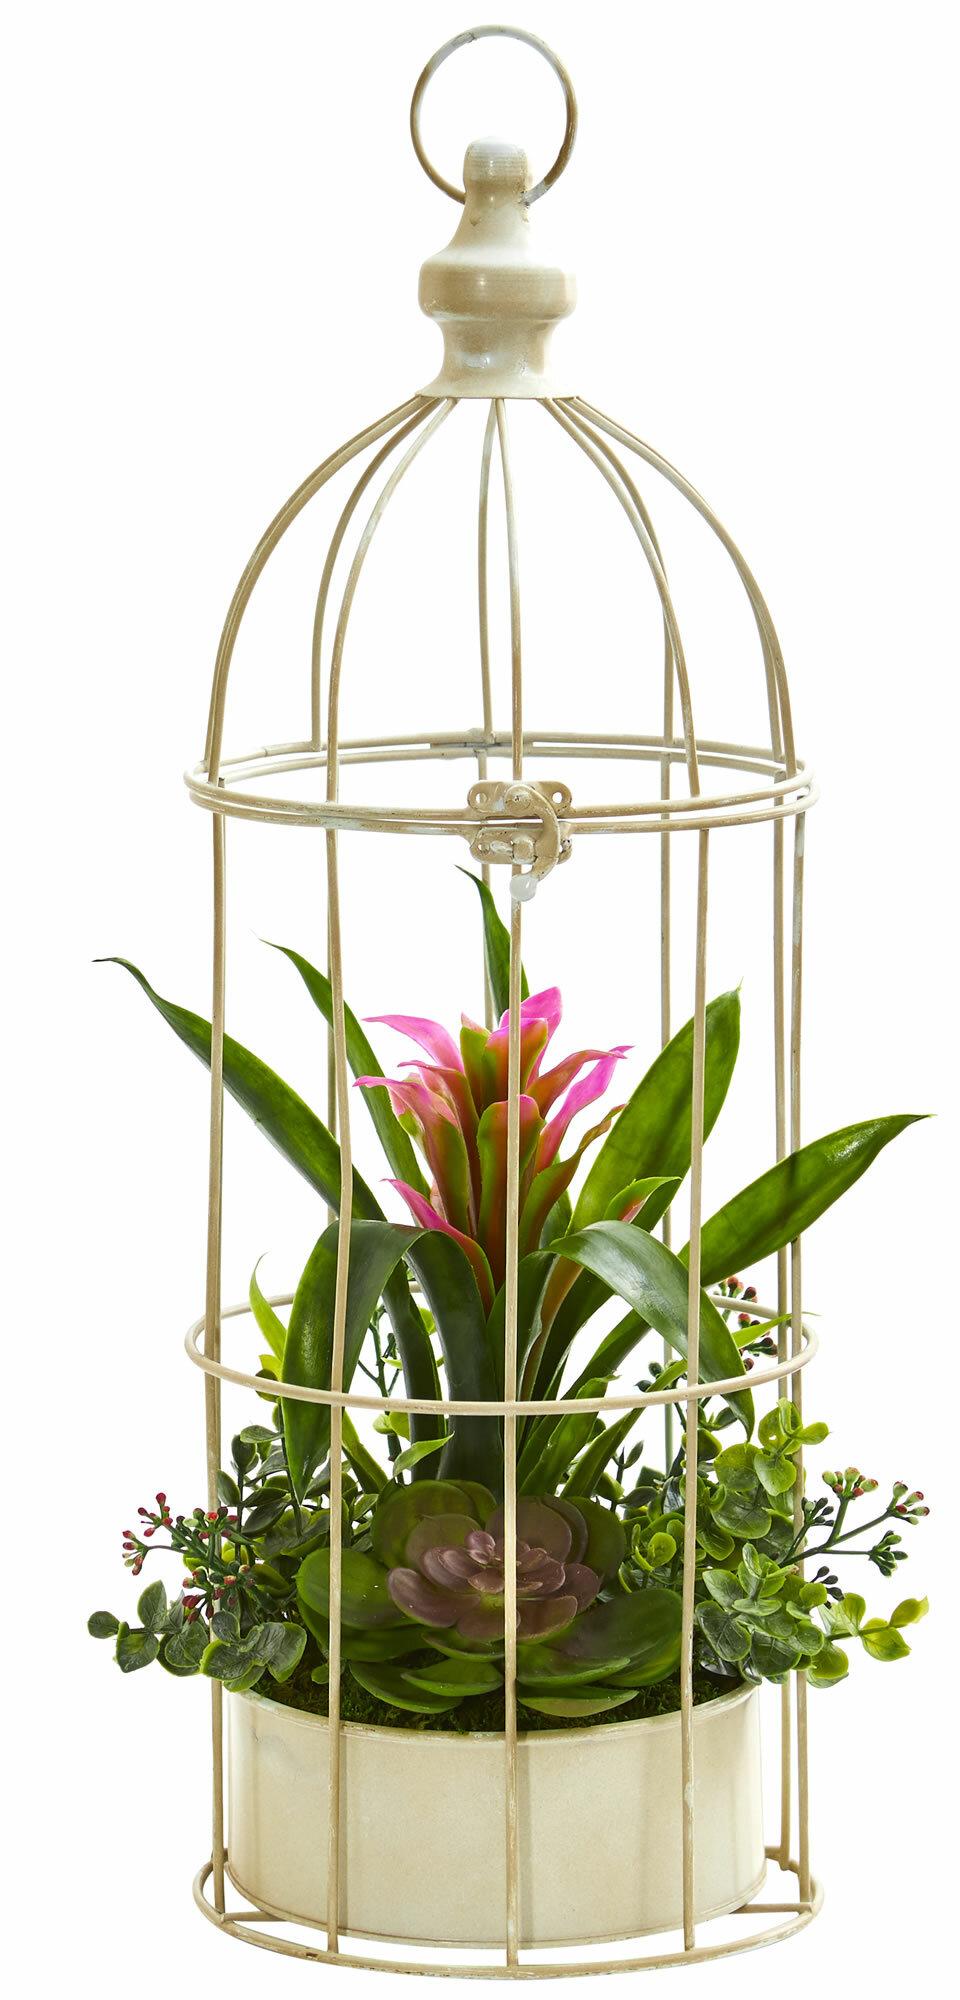 Ophelia Co Bromeliad Arrangement Hanging Succulent Plant In Bird Cage Reviews Wayfair